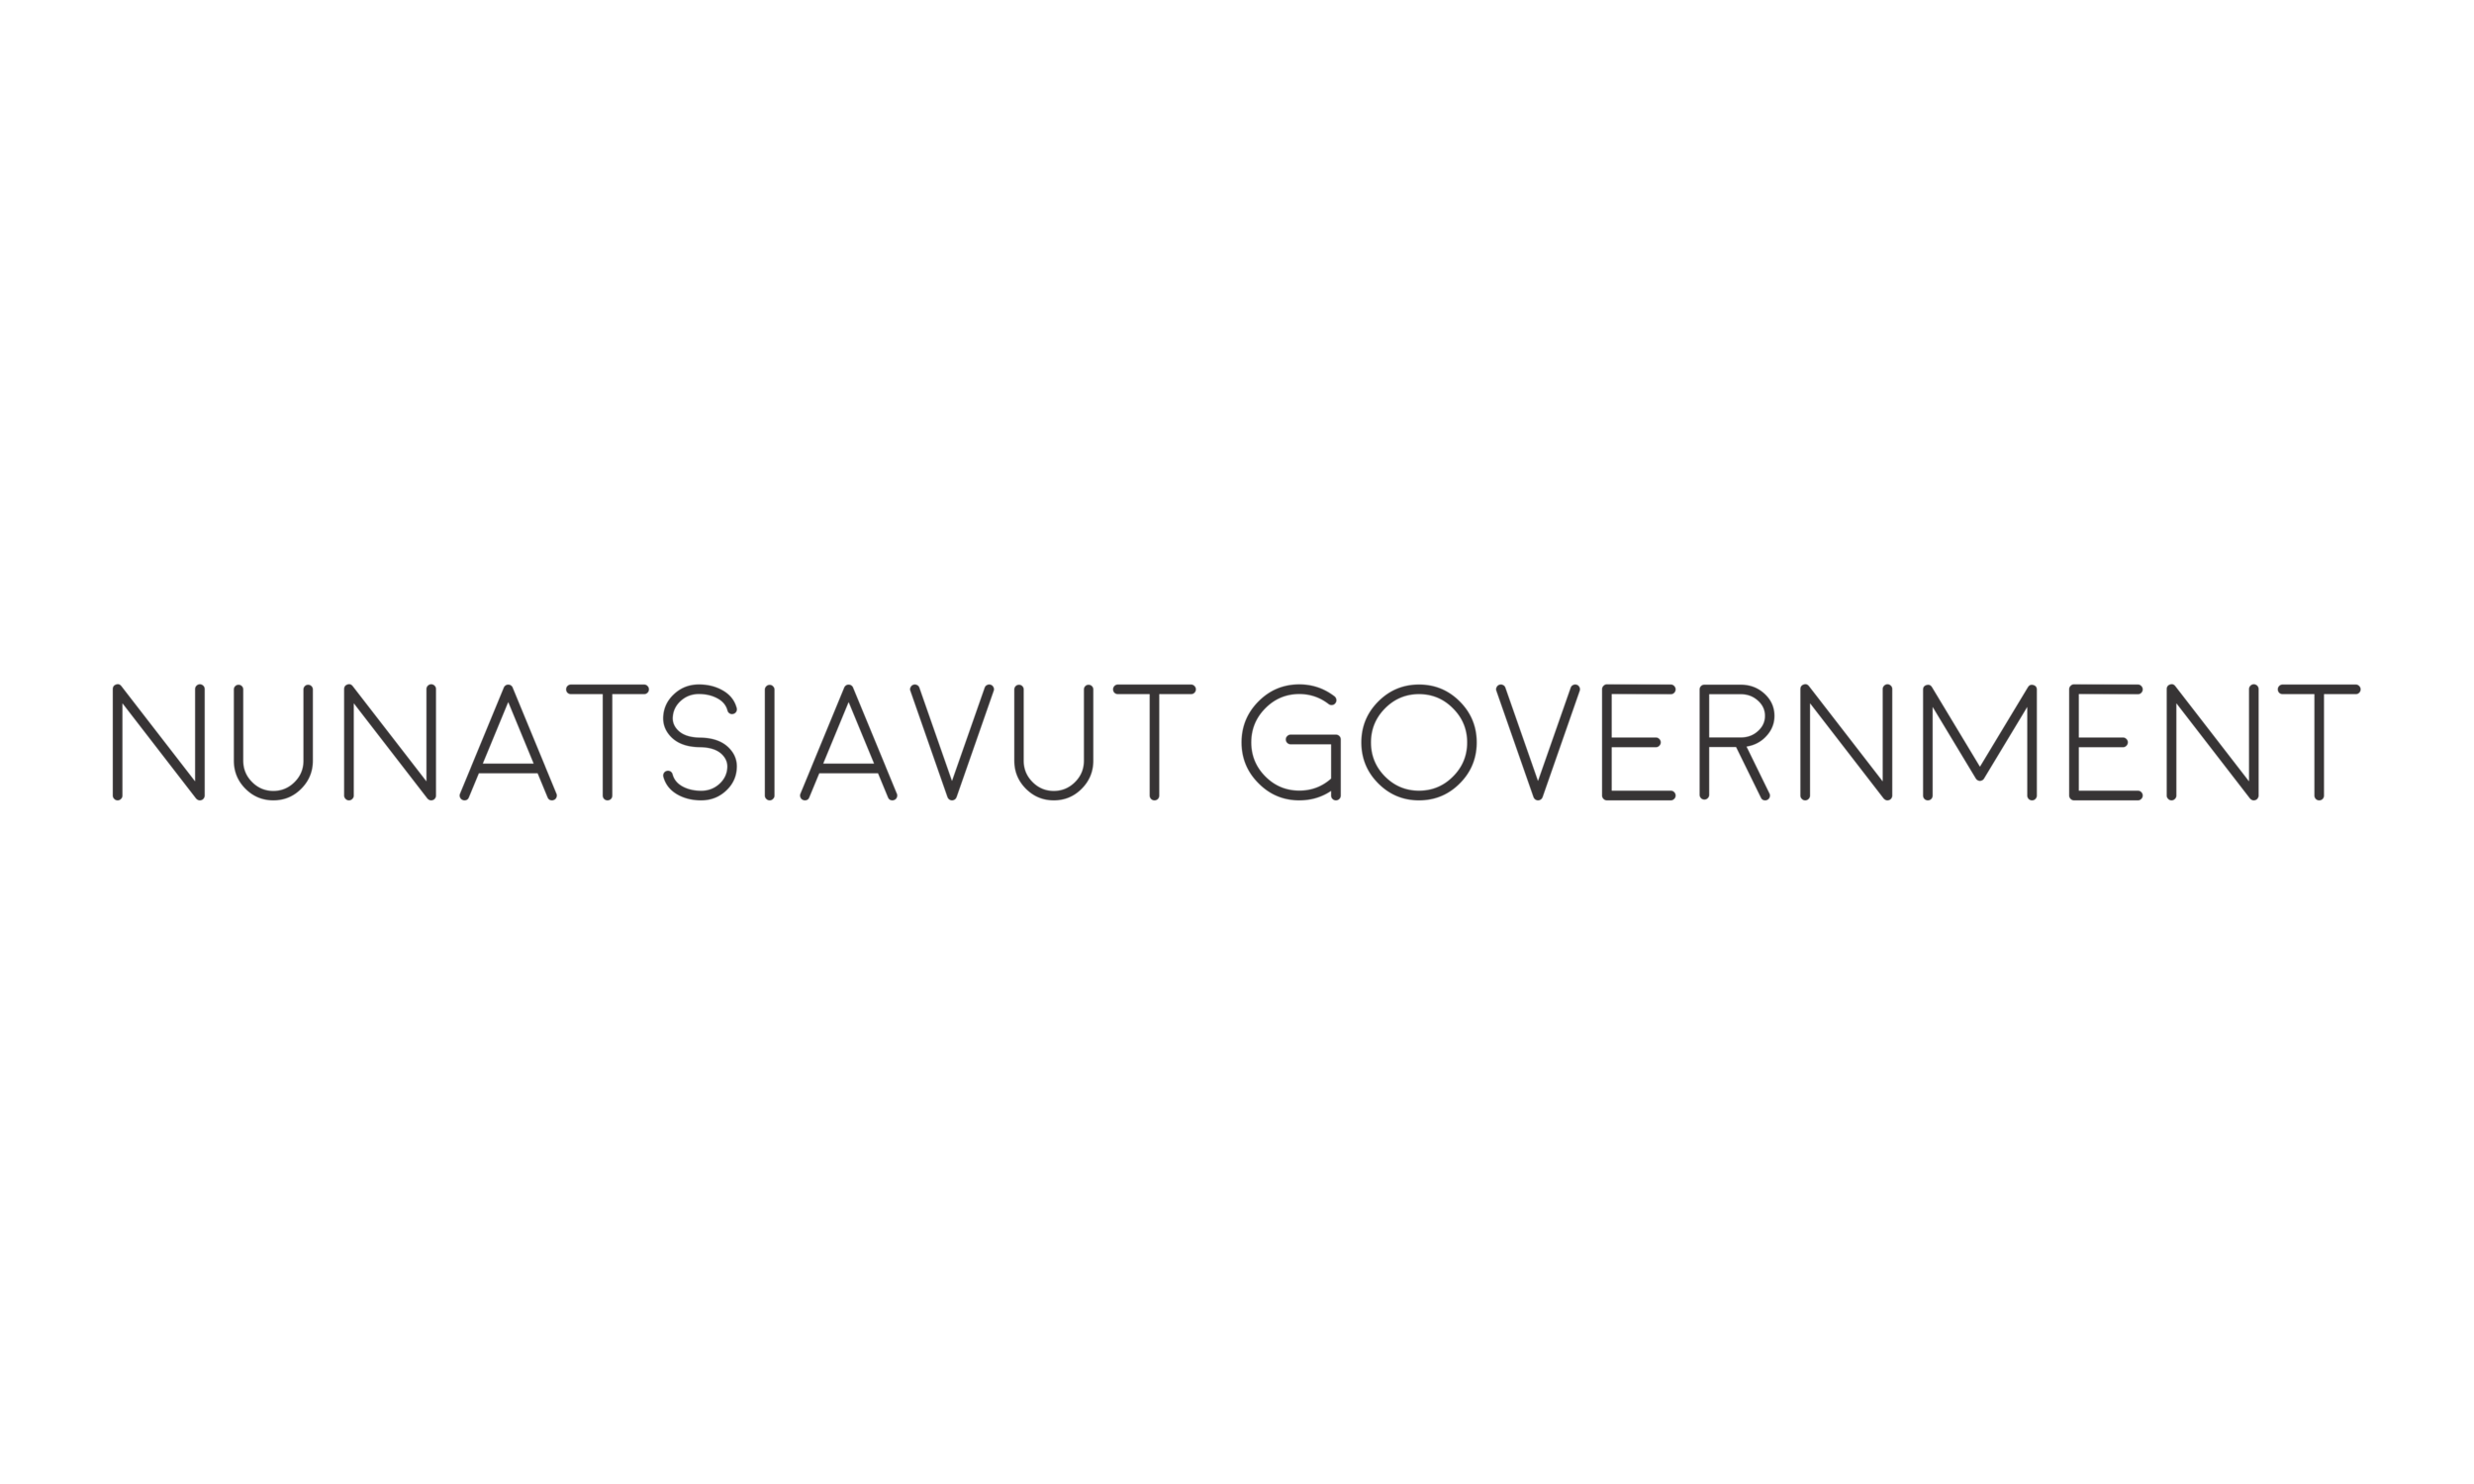 FOUNDING - Nunatsiavut Government.png